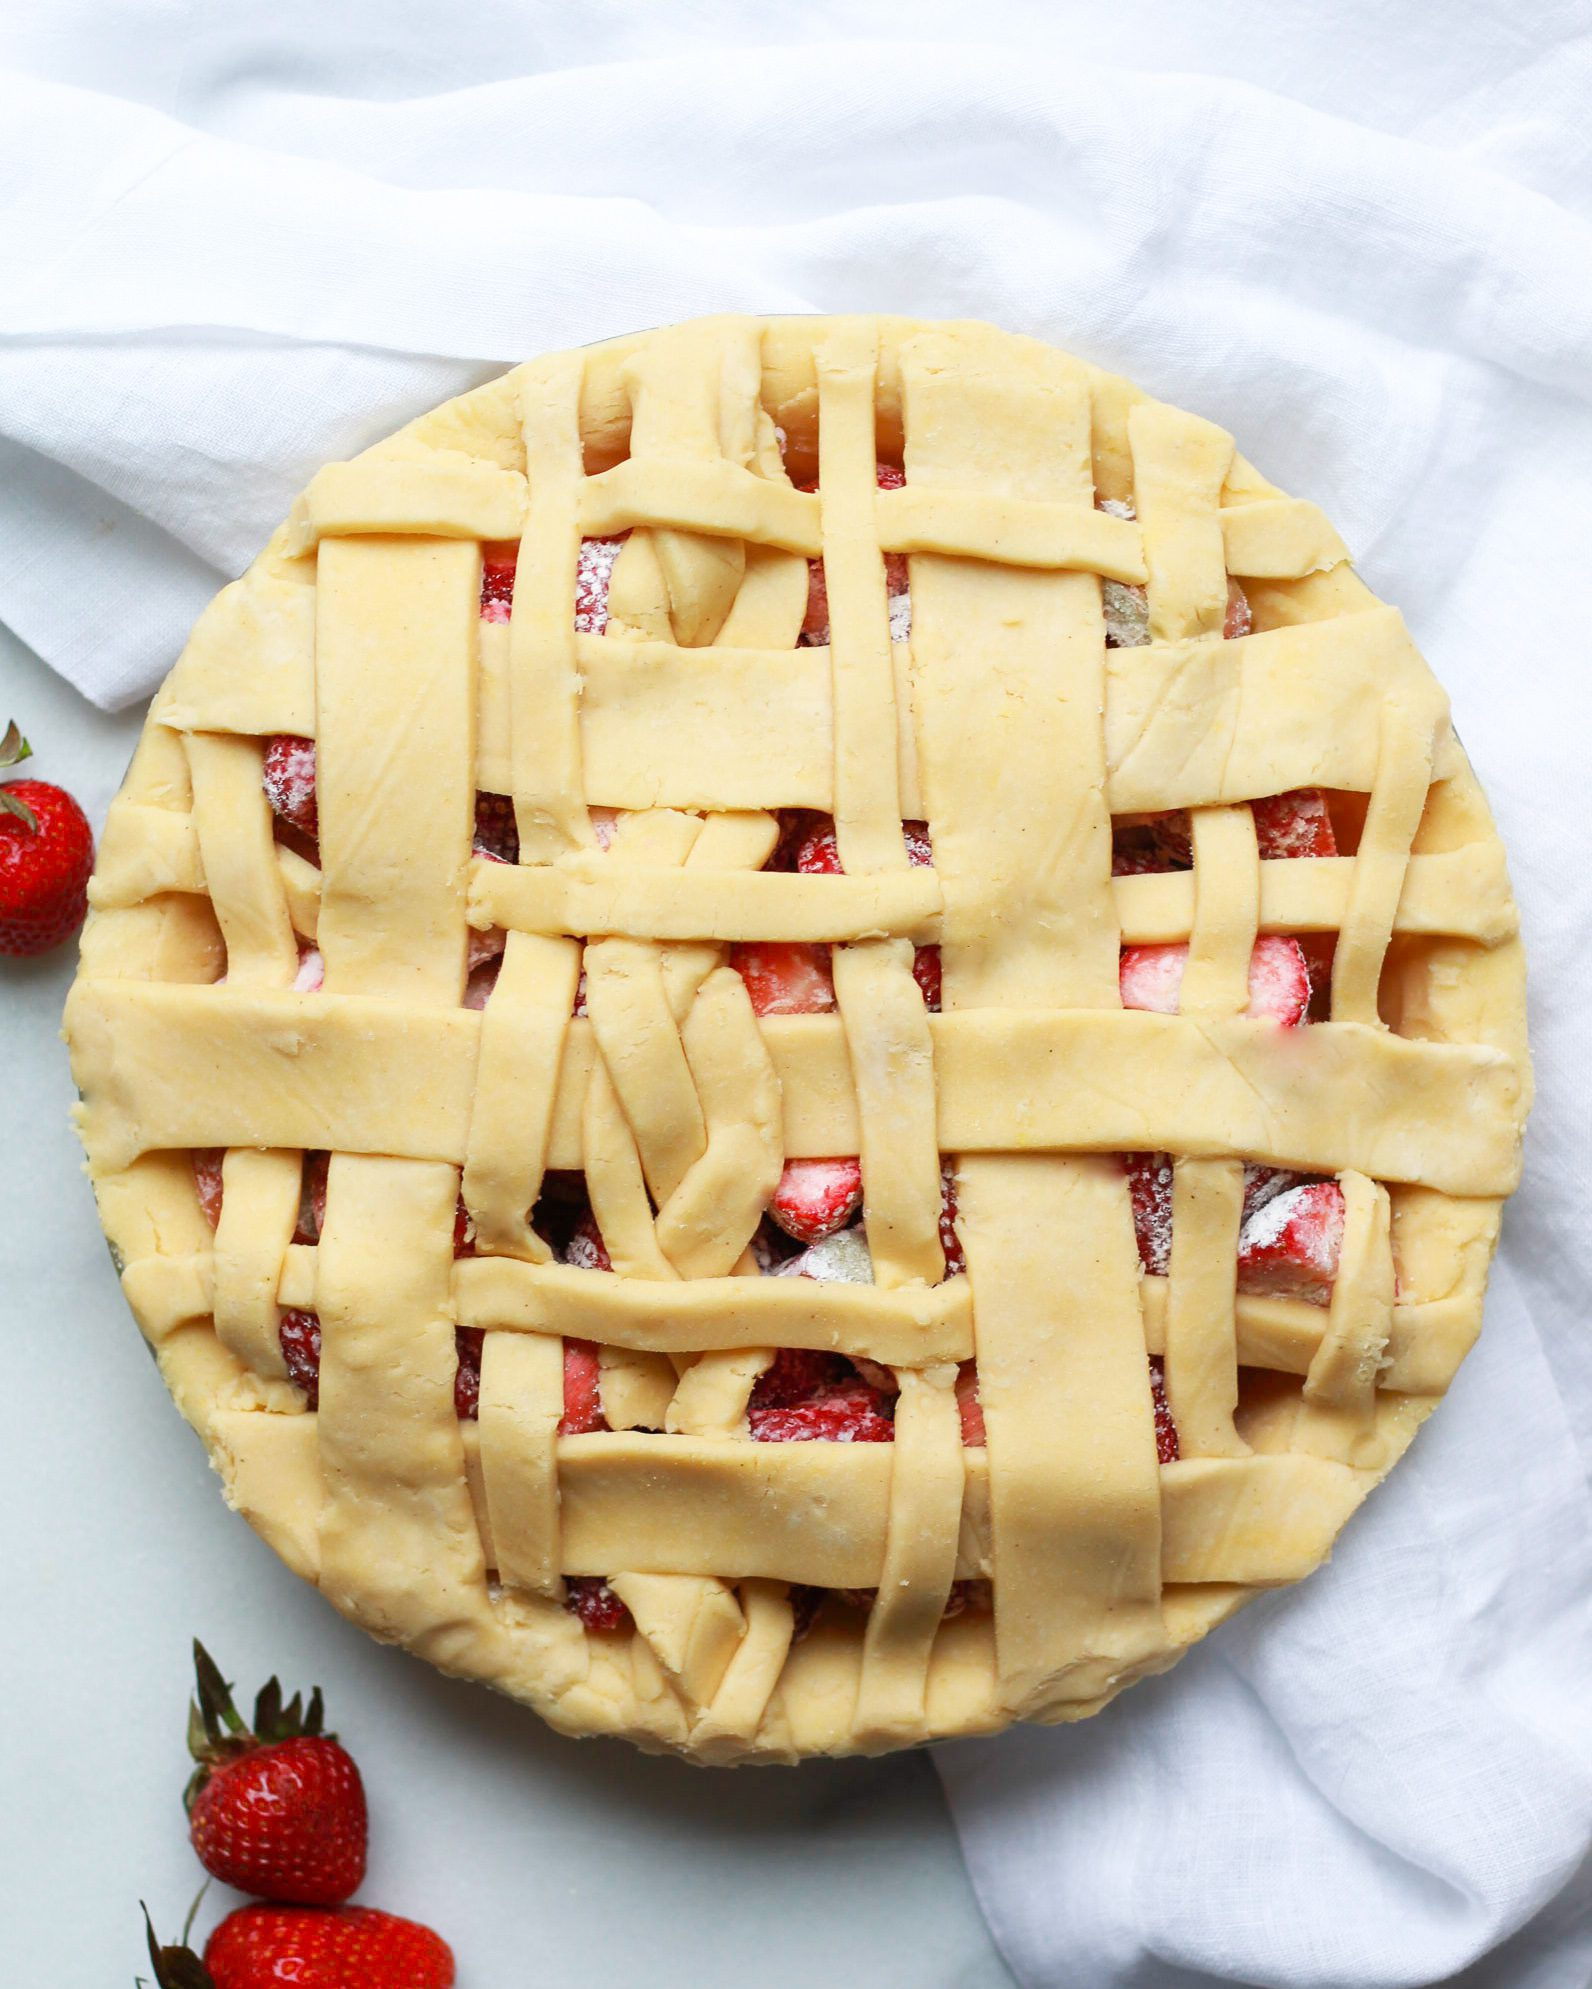 paleo strawberry rhubarb pie before it's baked